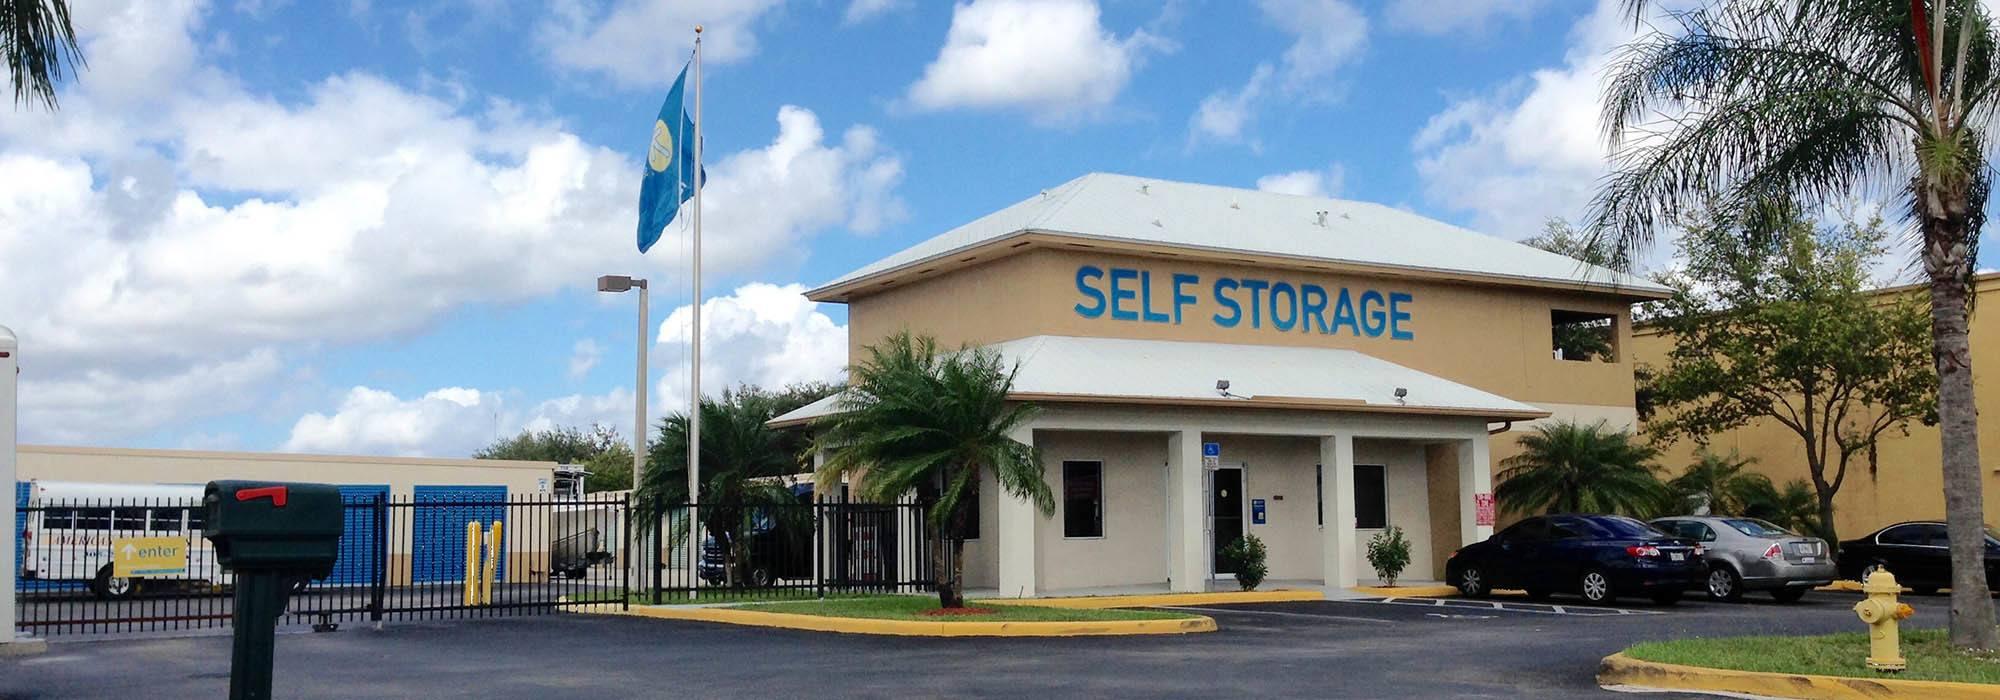 Self storage in Florida City FL